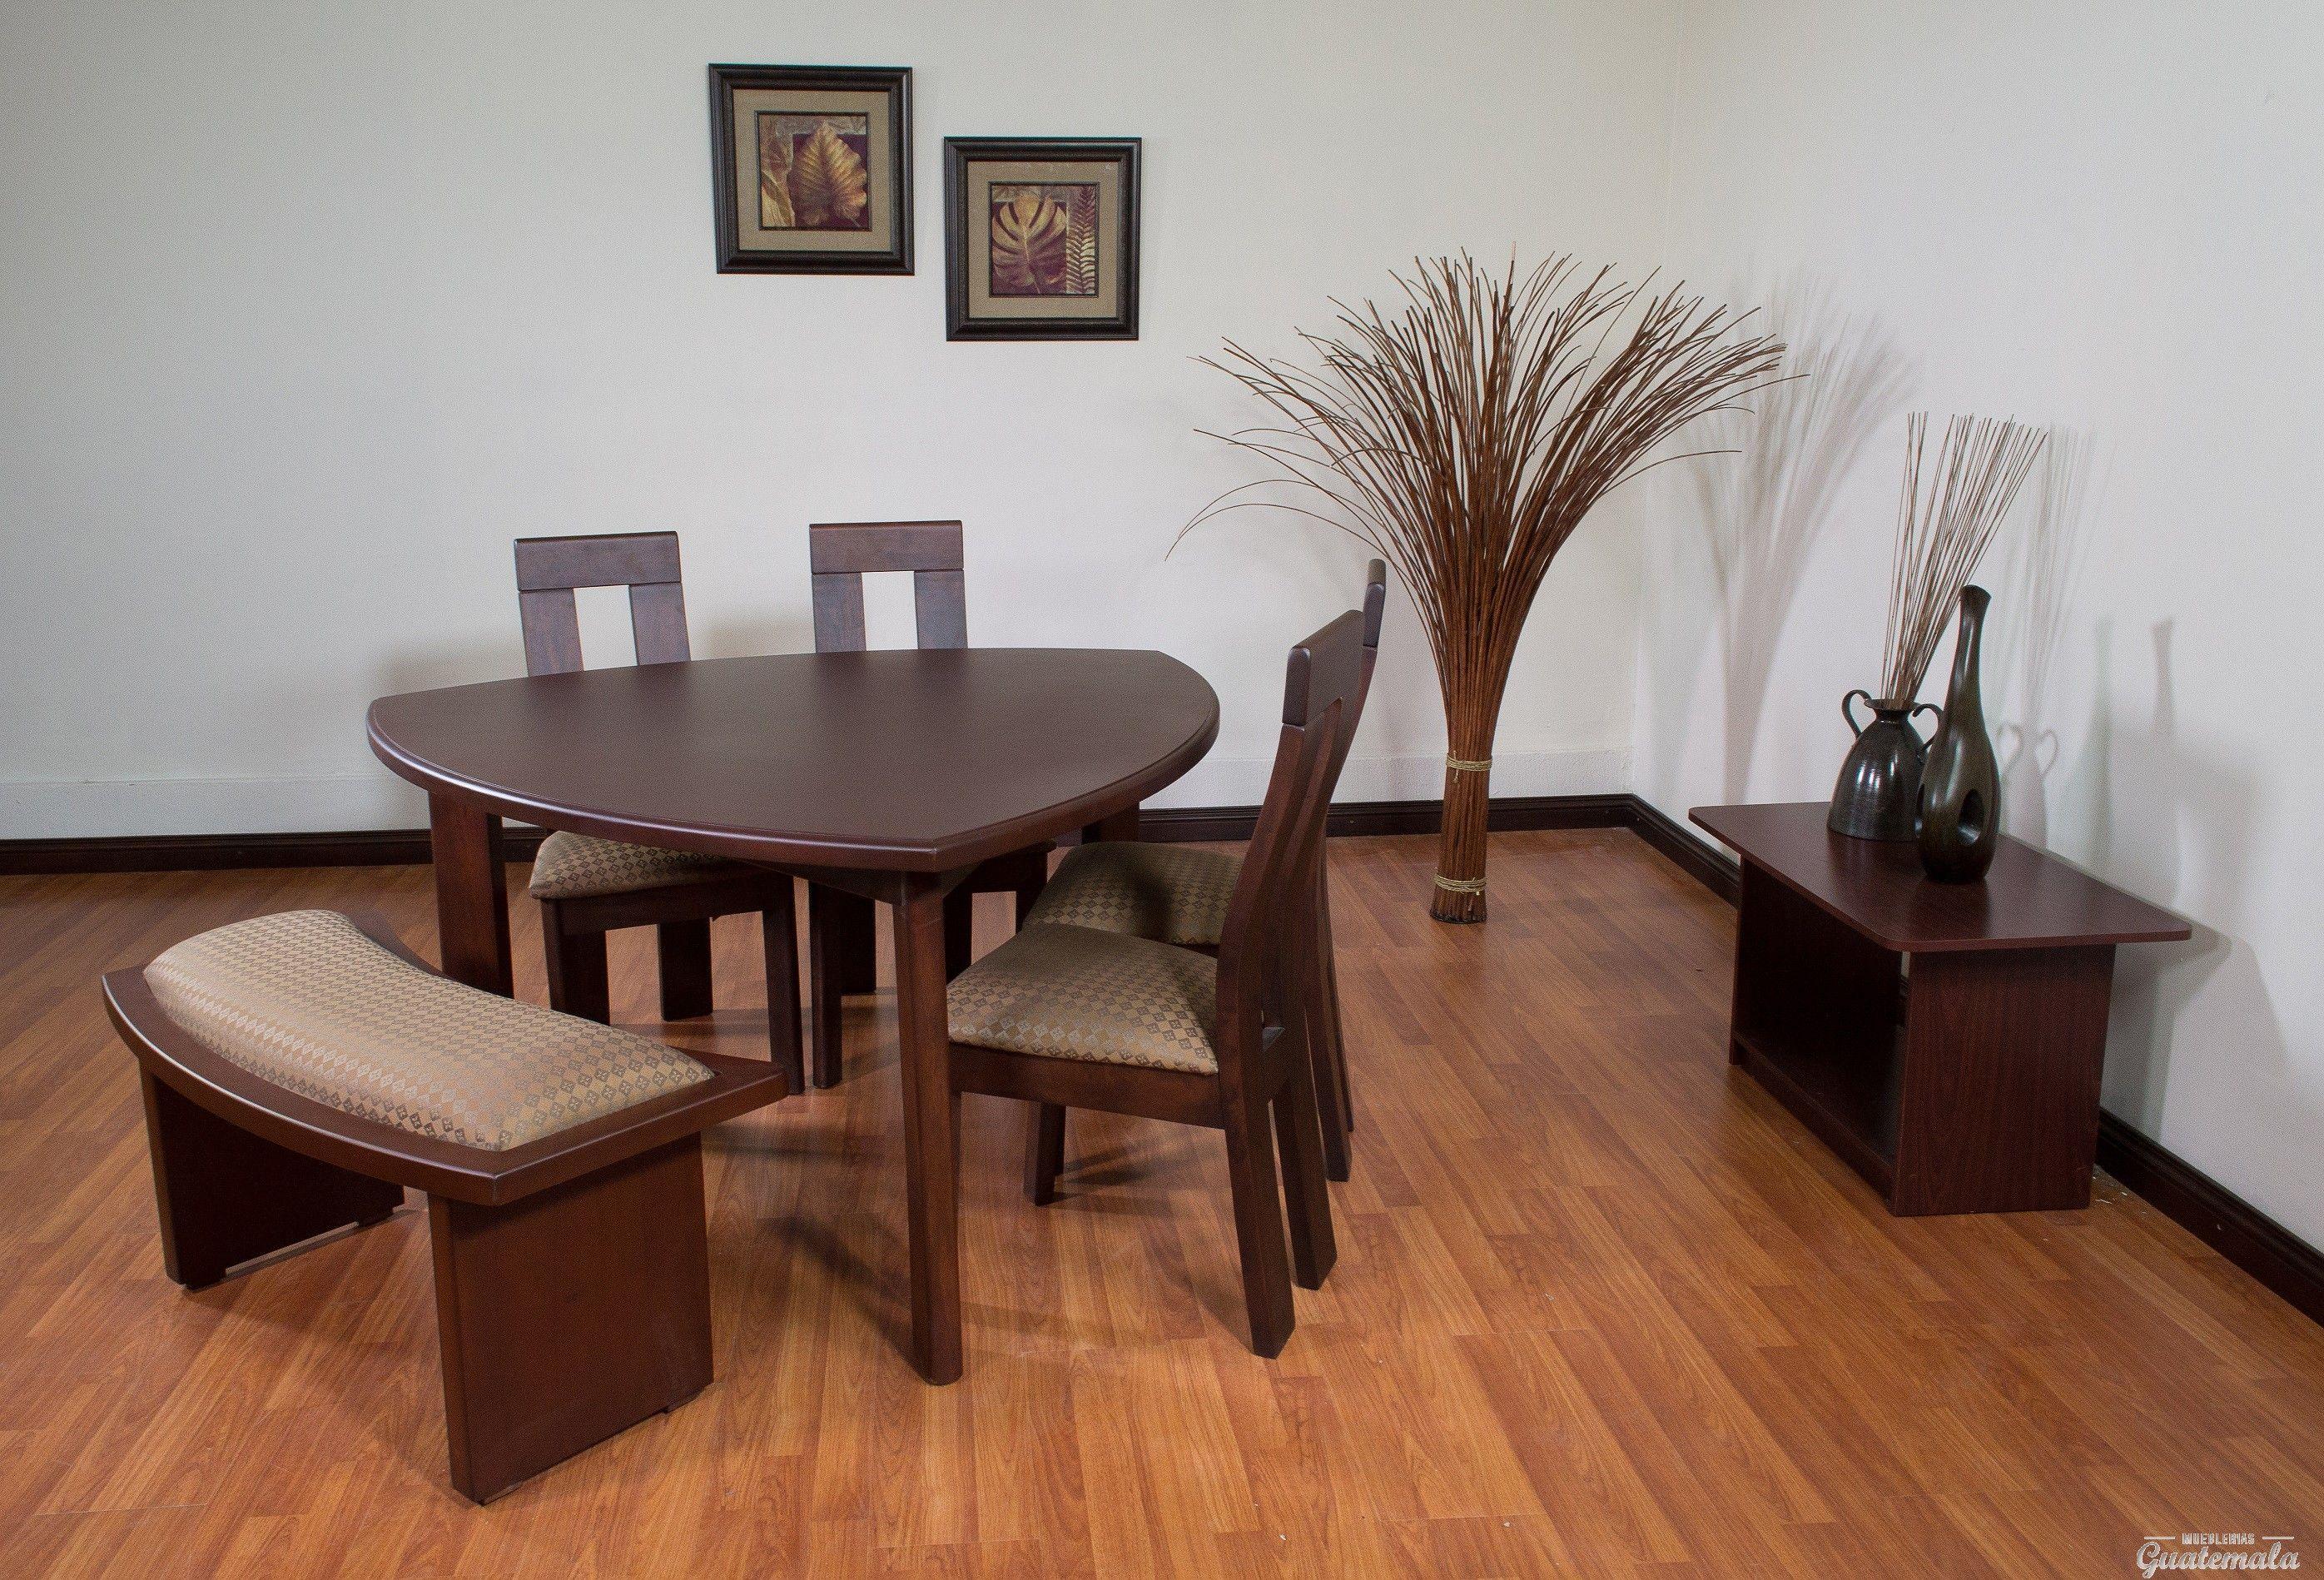 Comedor triangular primiun varios hogar mesas de for Muebles comedores pequenos